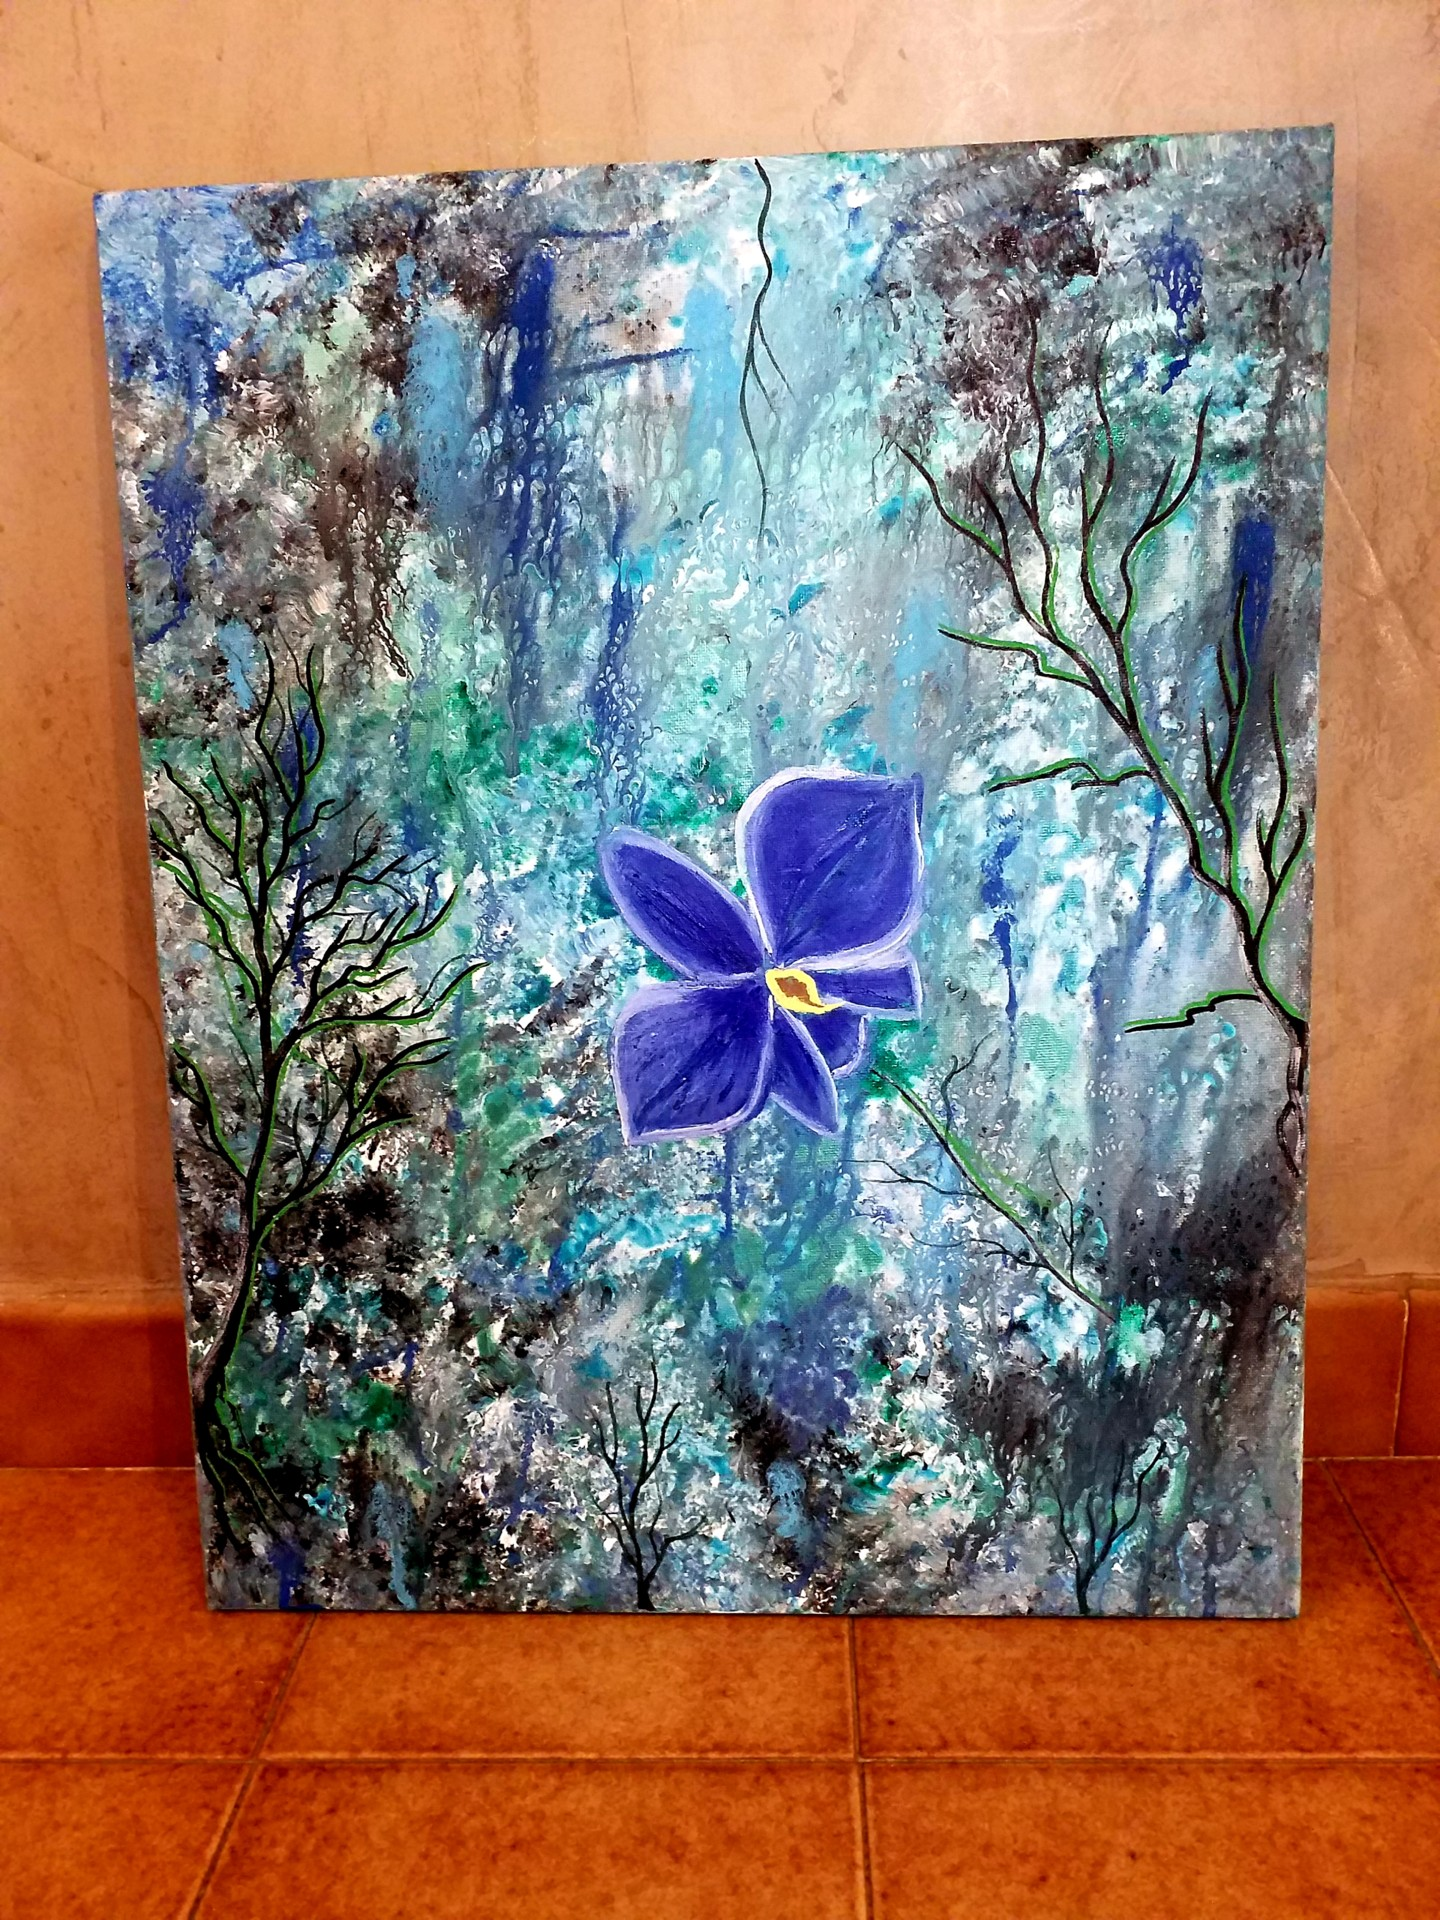 Florence Castelli  Flofloyd - La fleur bleue